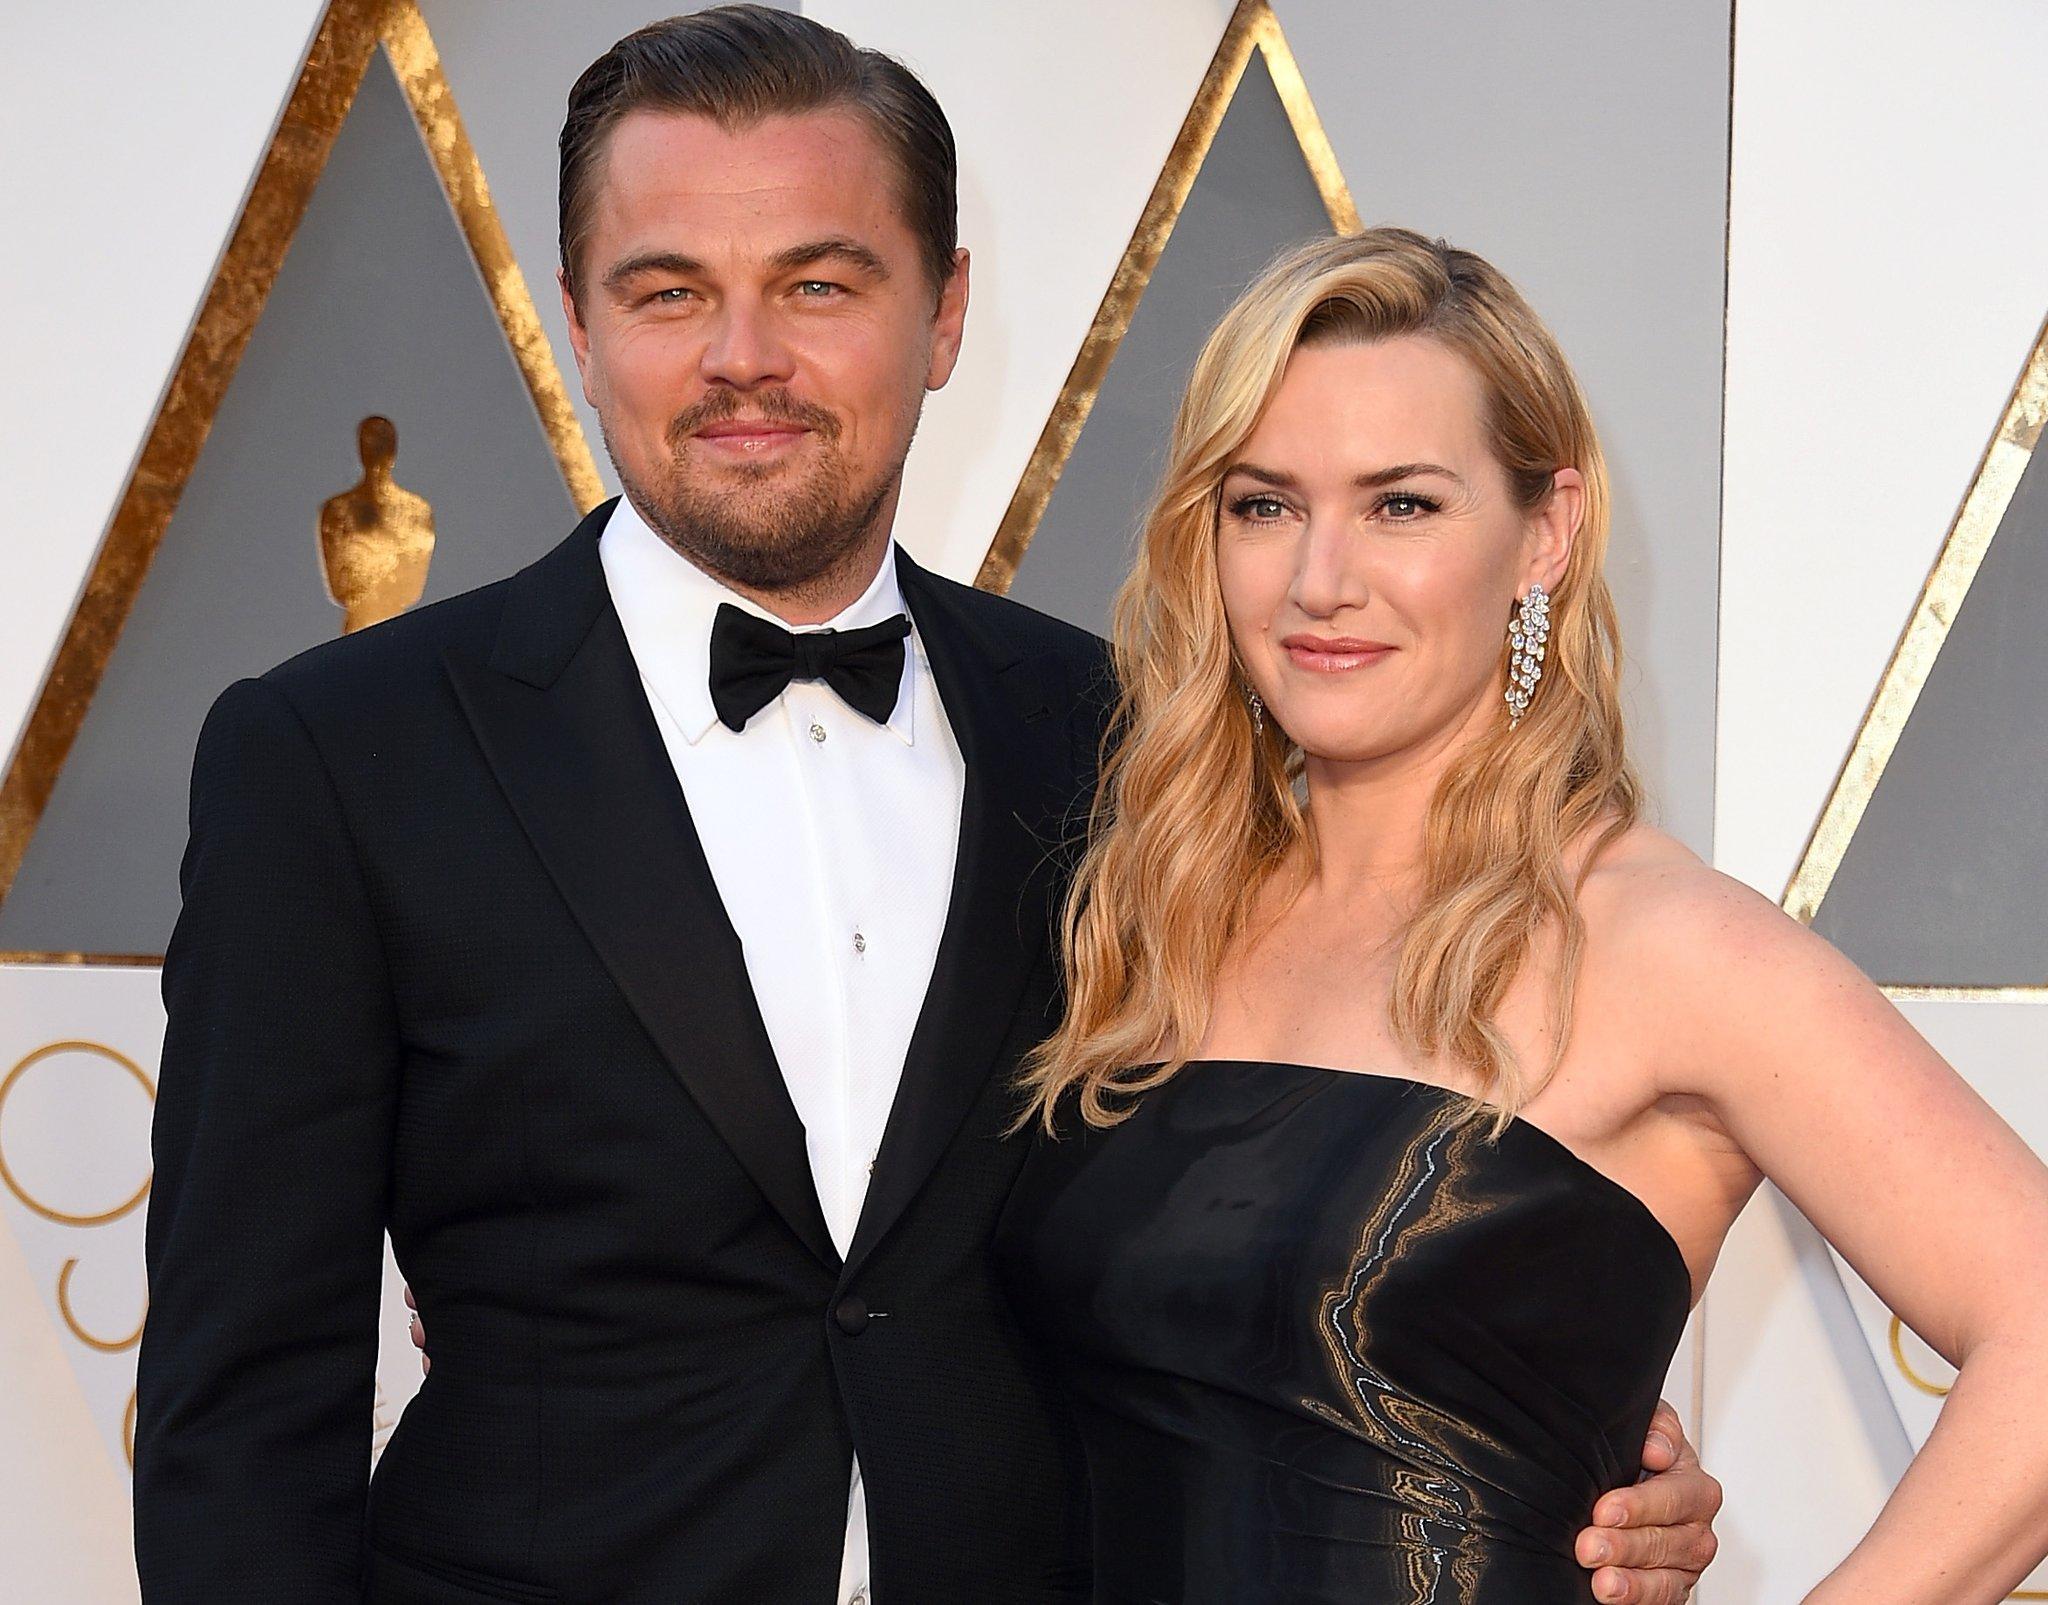 Leonardo DiCaprio et Kate Winslet Image: Getty / Steve Granitz